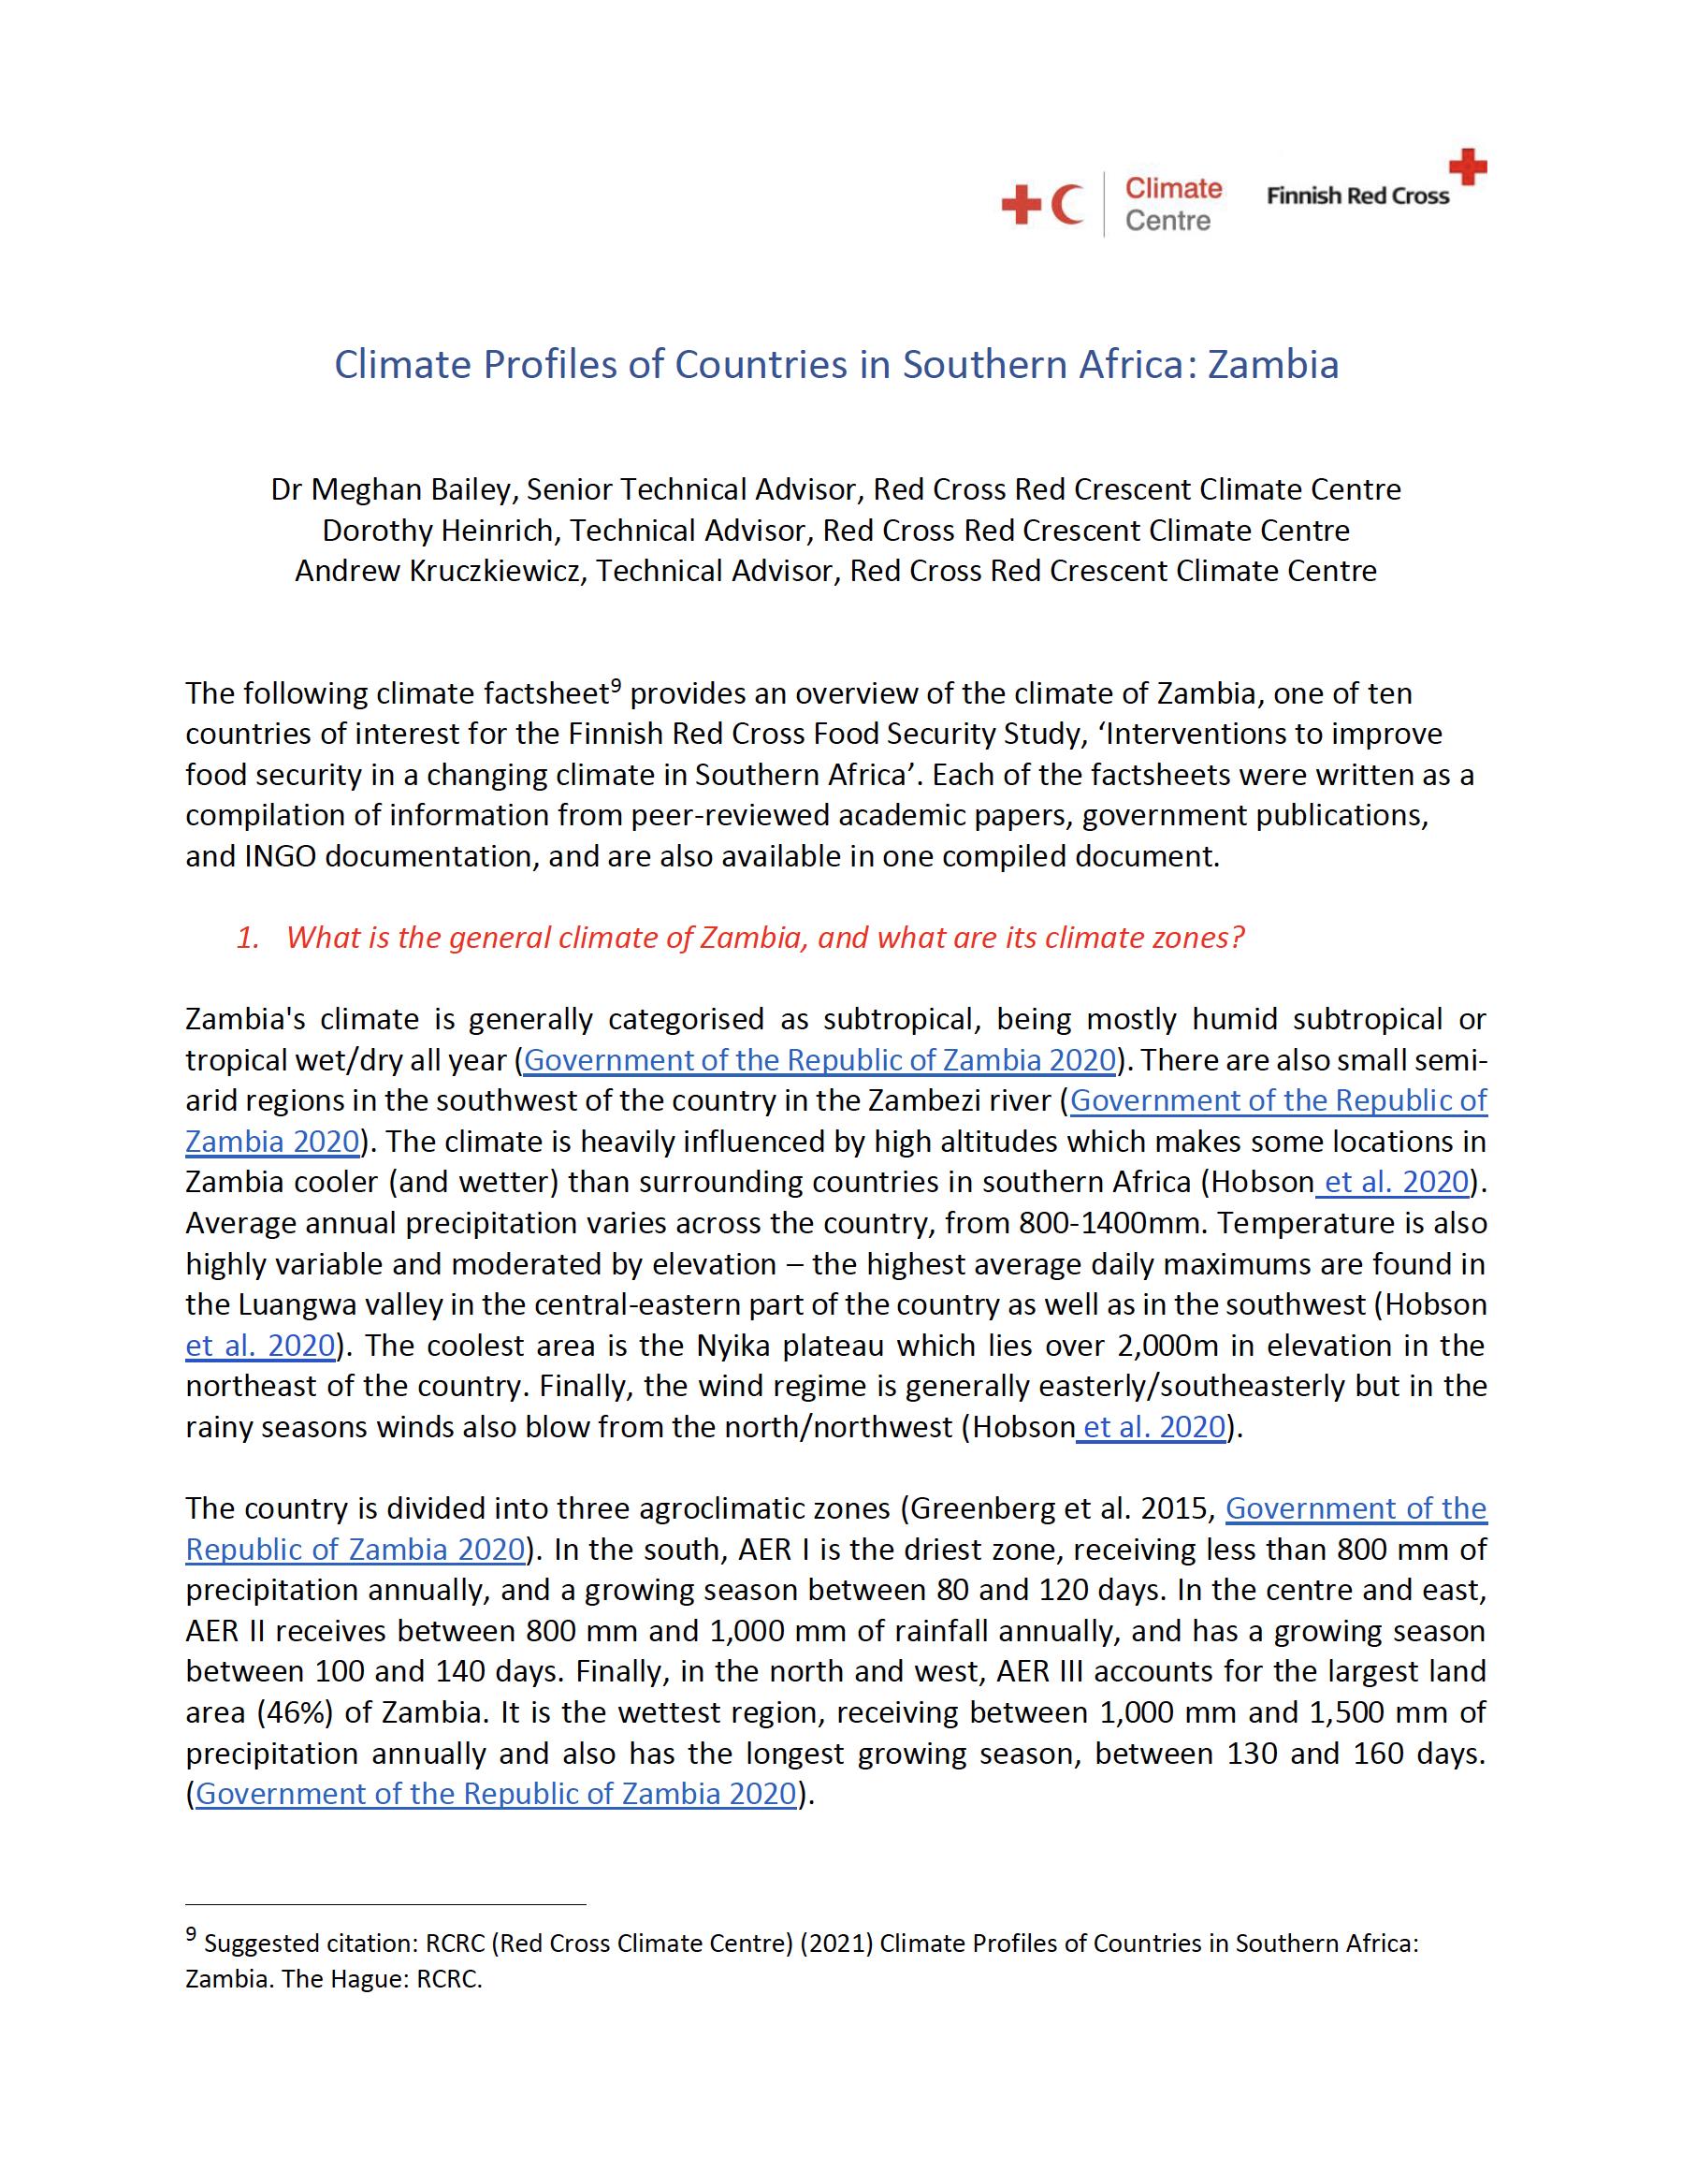 Climate Factsheet Zambia